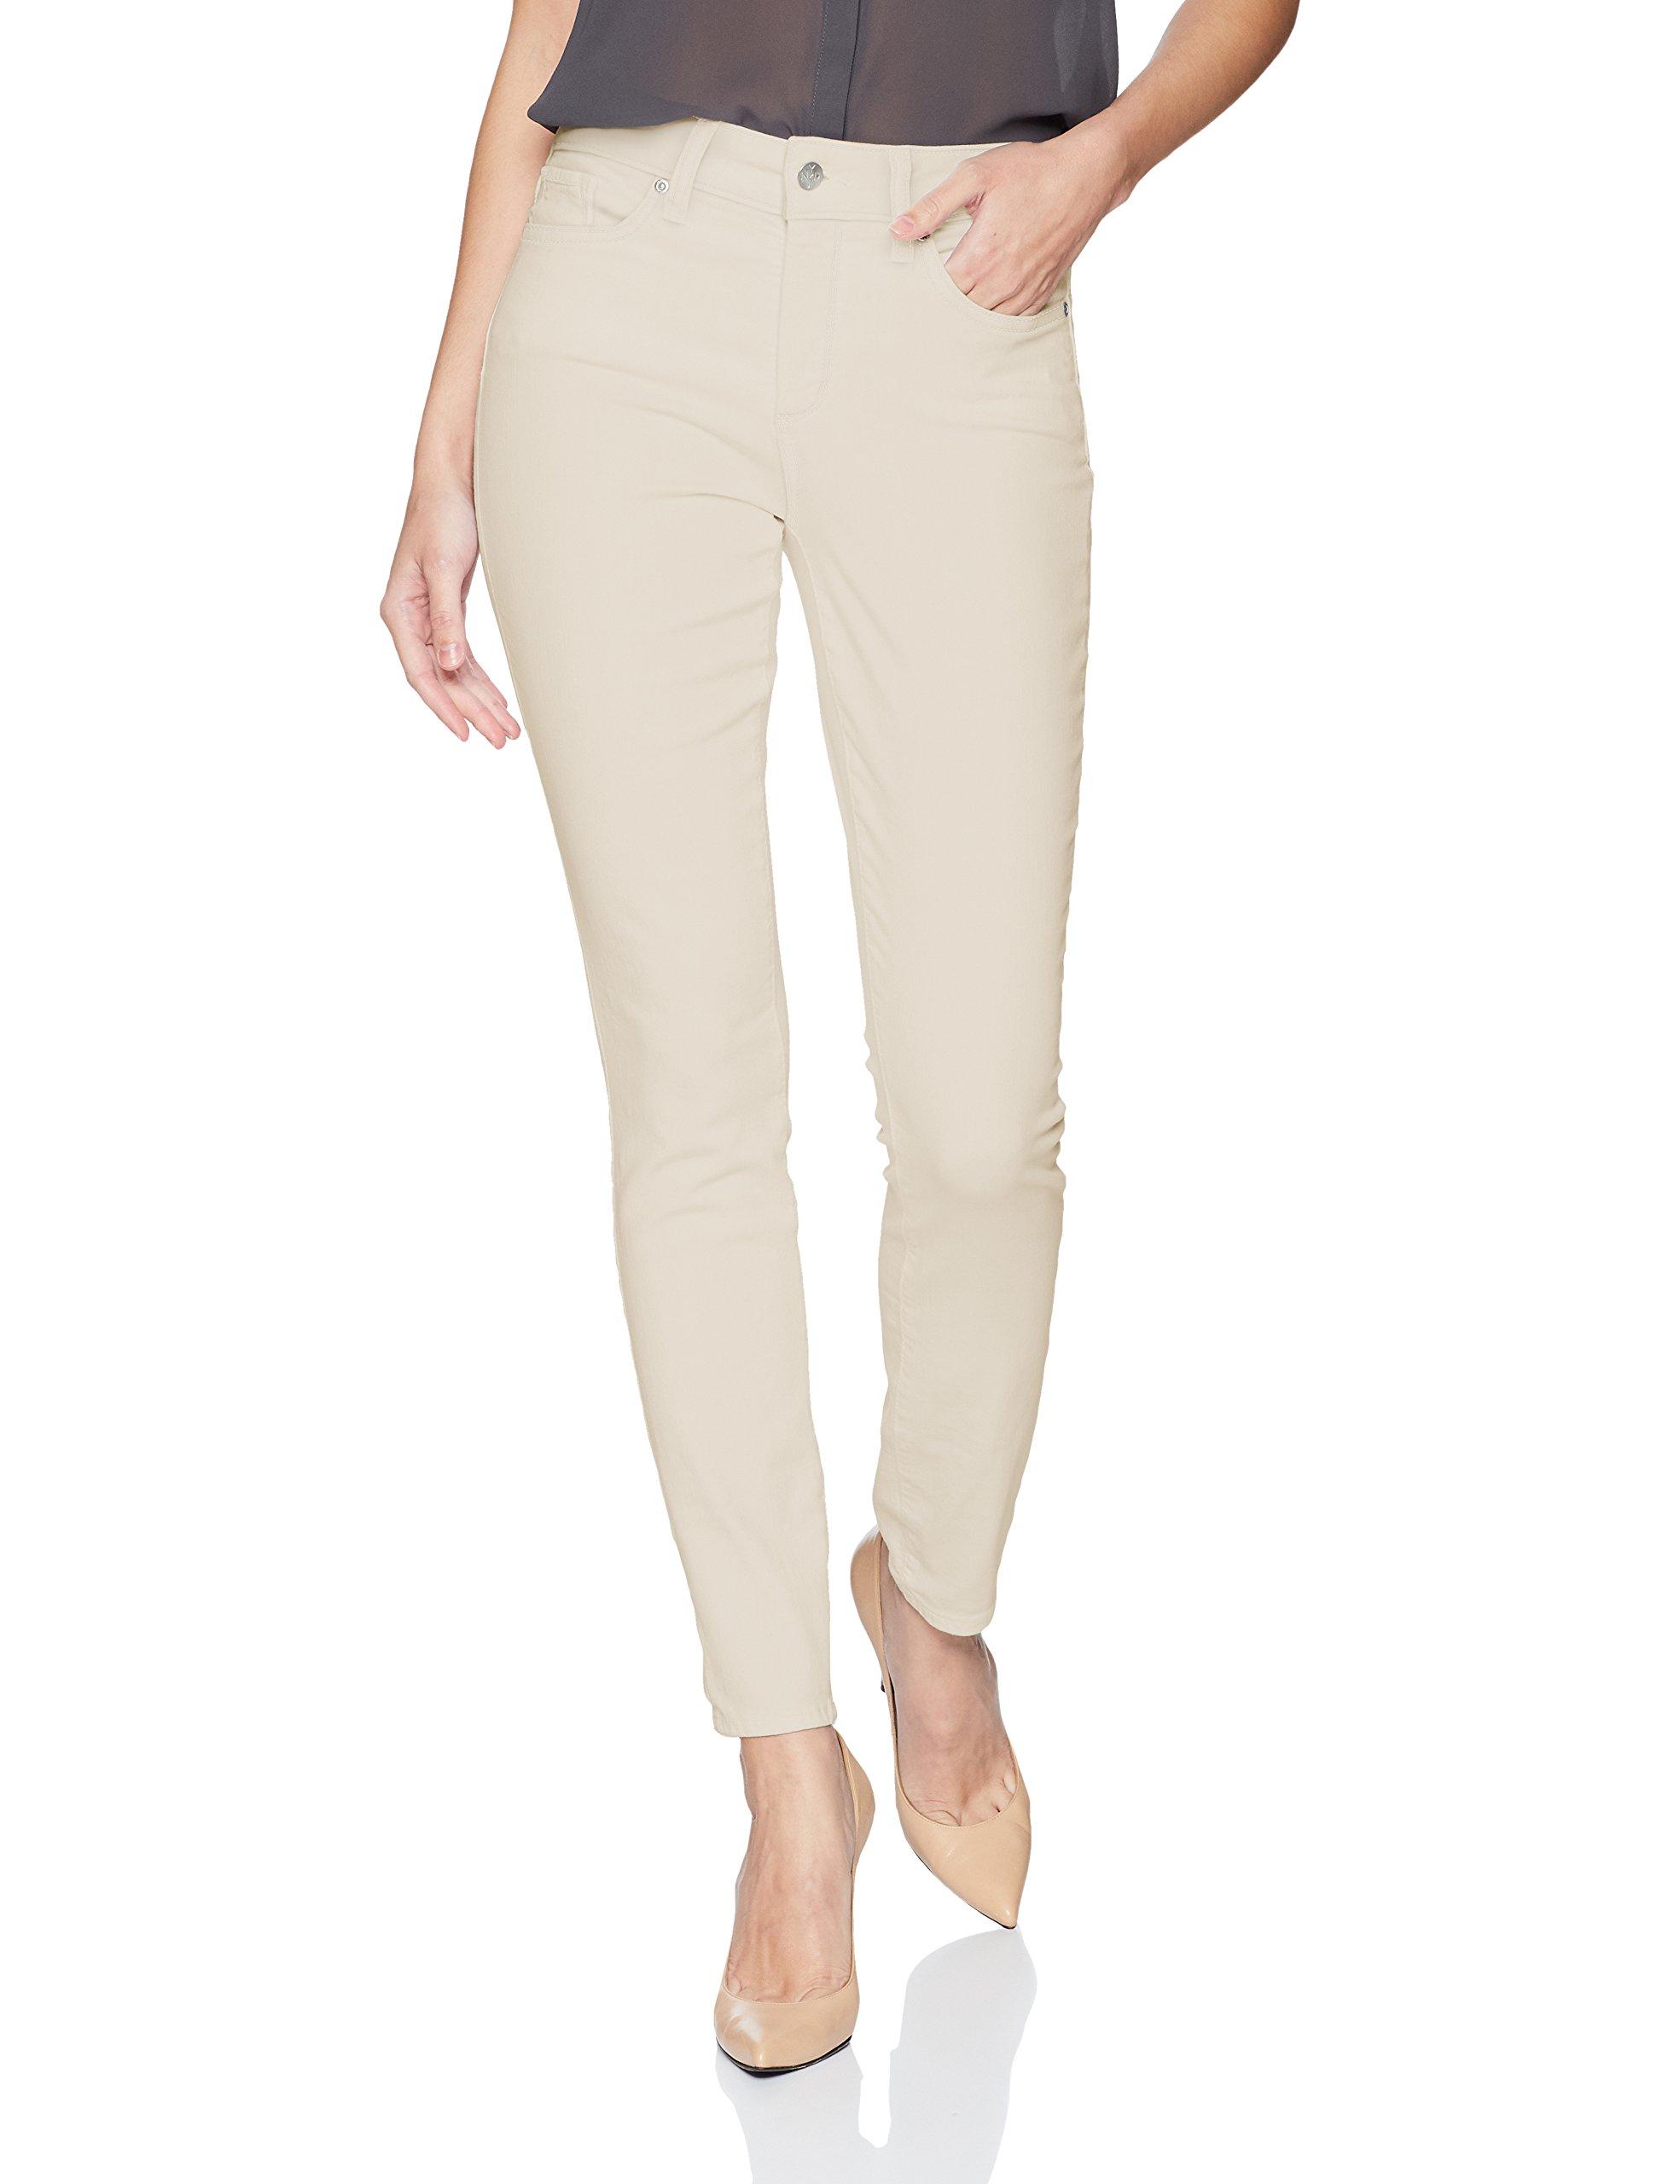 NYDJ Women's Ami Skinny Legging Jeans, FEATHER, 12